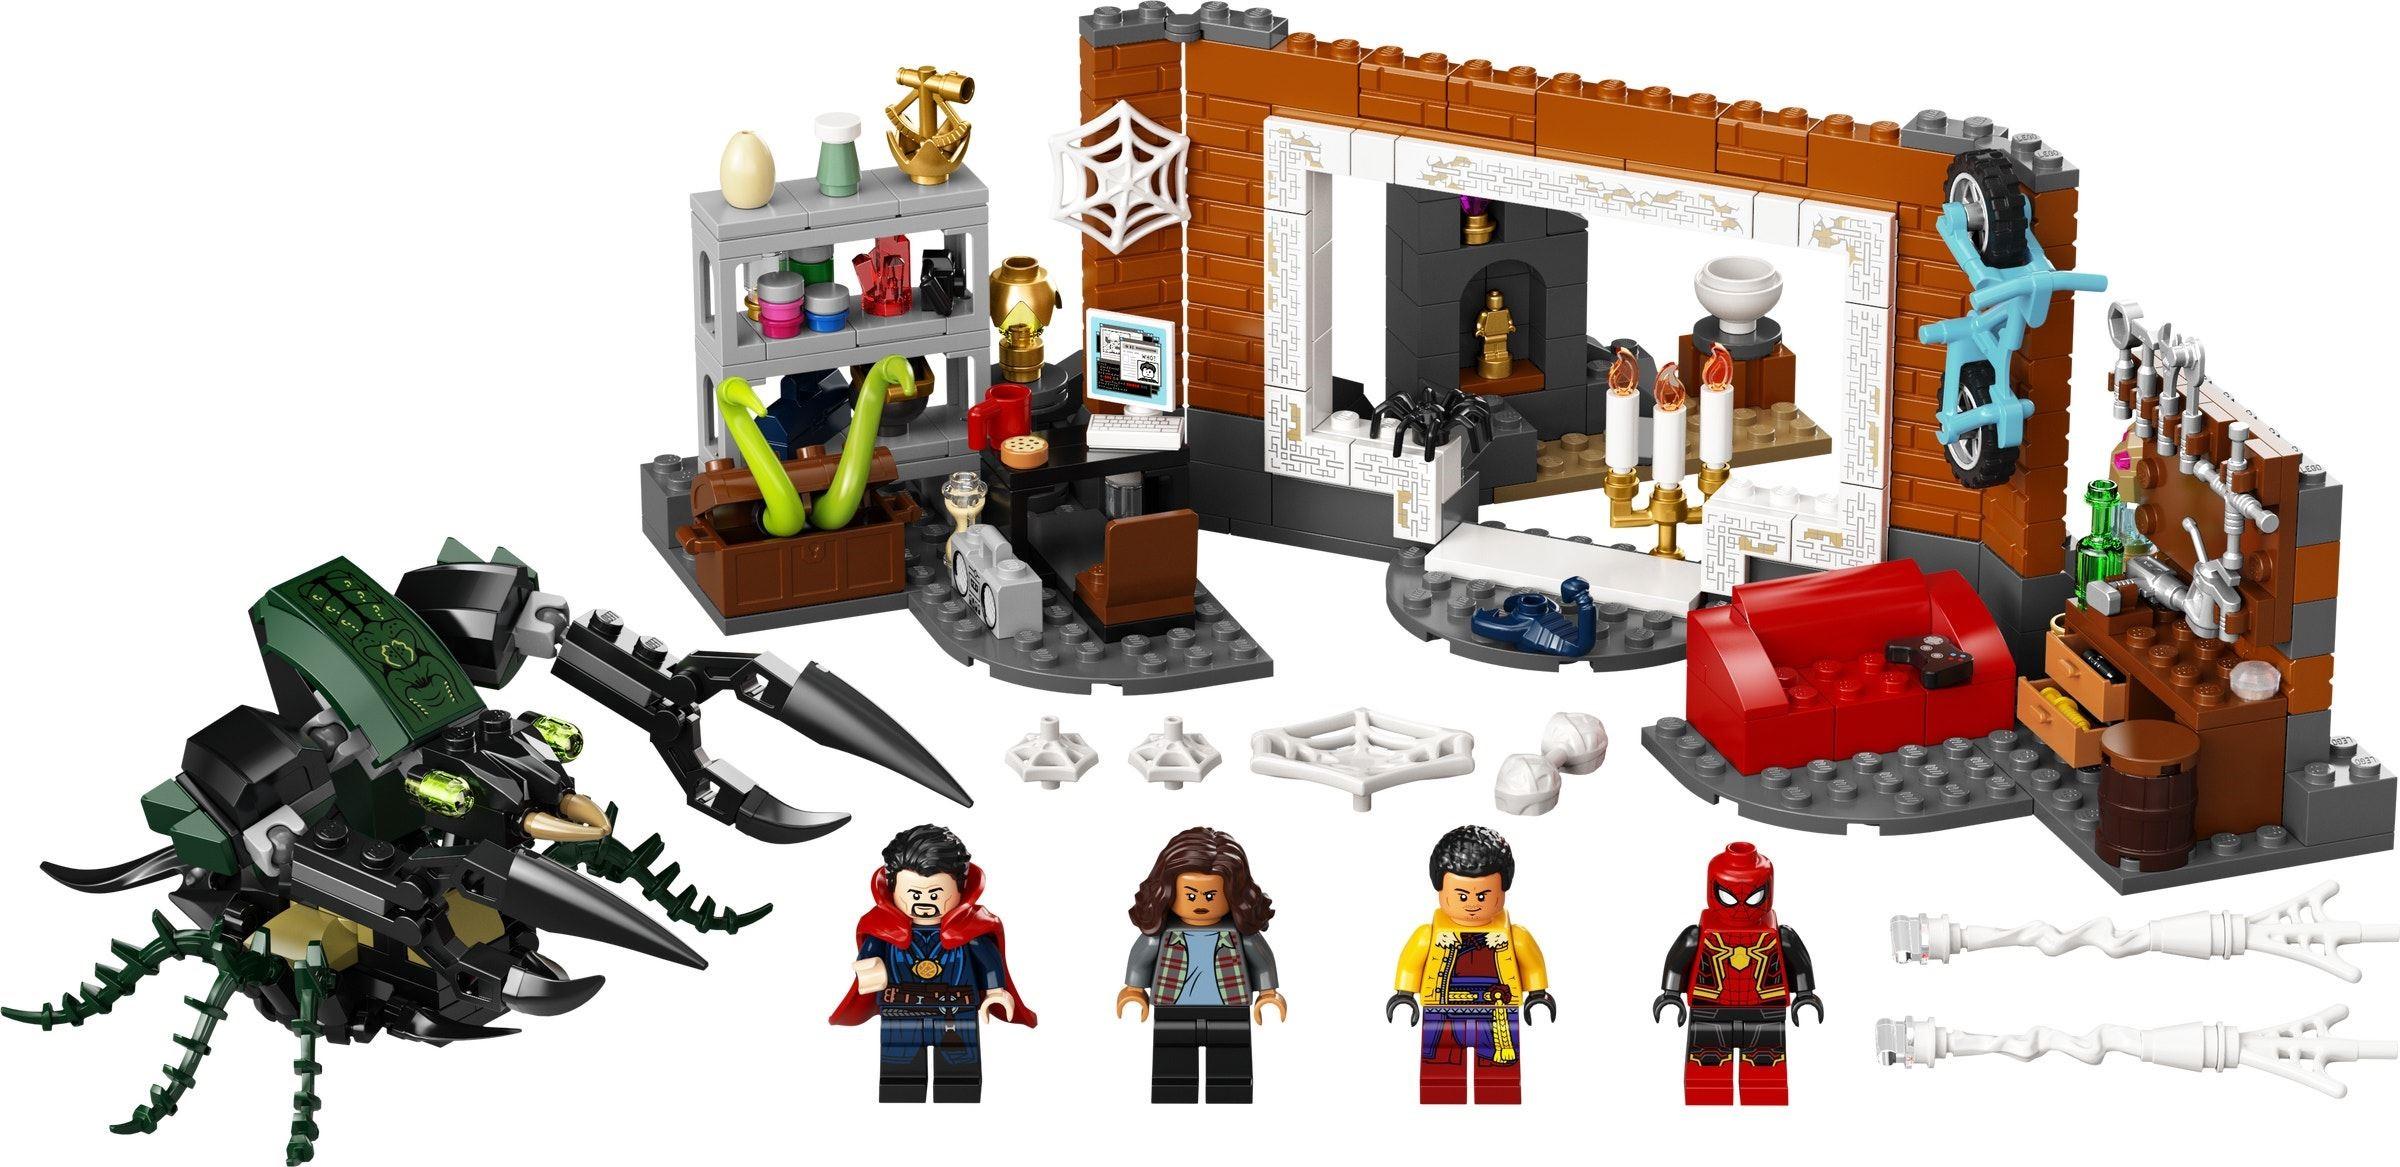 Огляд набору LEGO Marvel Super Heroes 76185 Spider-Man at the Sanctum Workshop